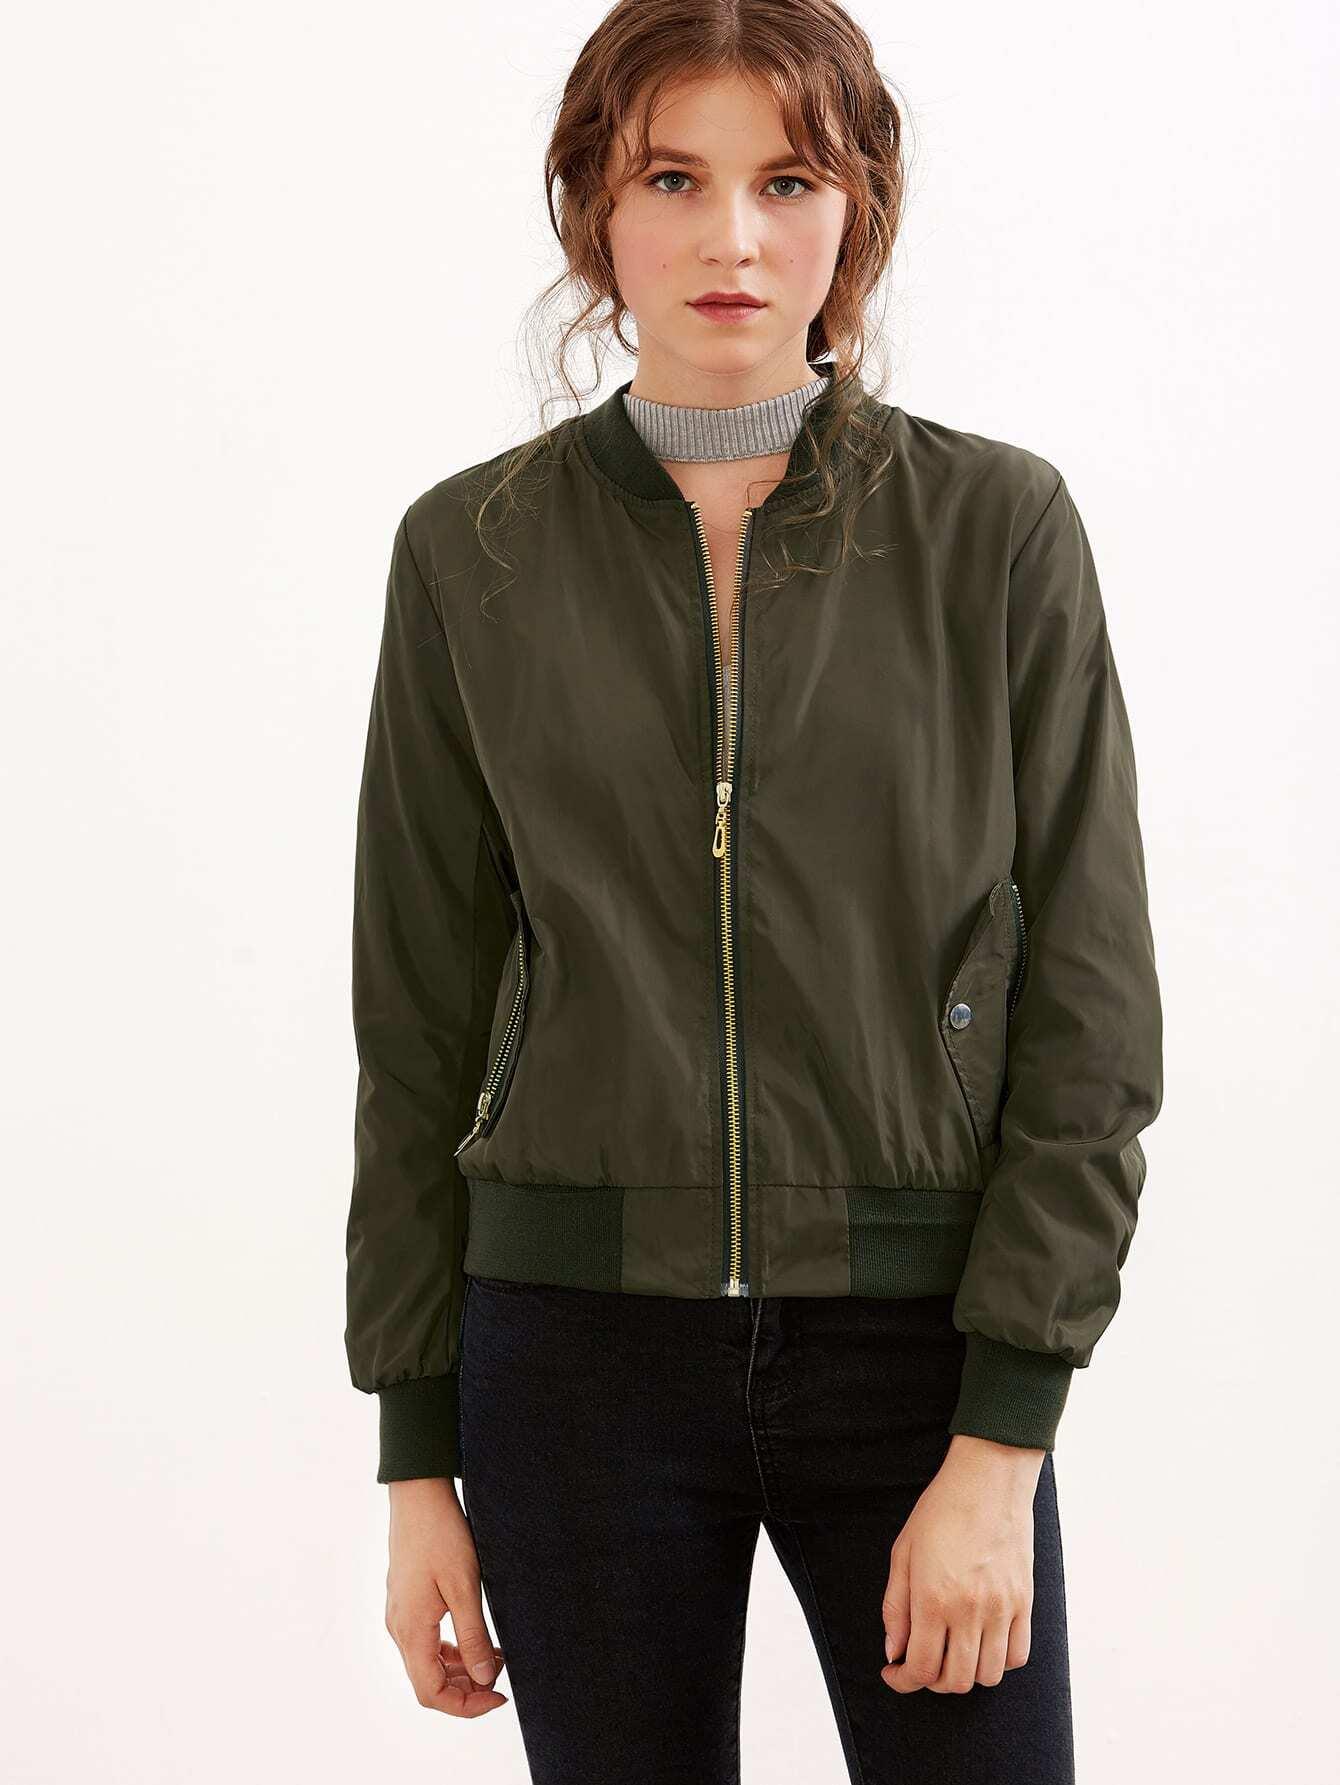 Army Green Shirred Sleeve Zipper Bomber Jacket striped sleeve bomber jacket